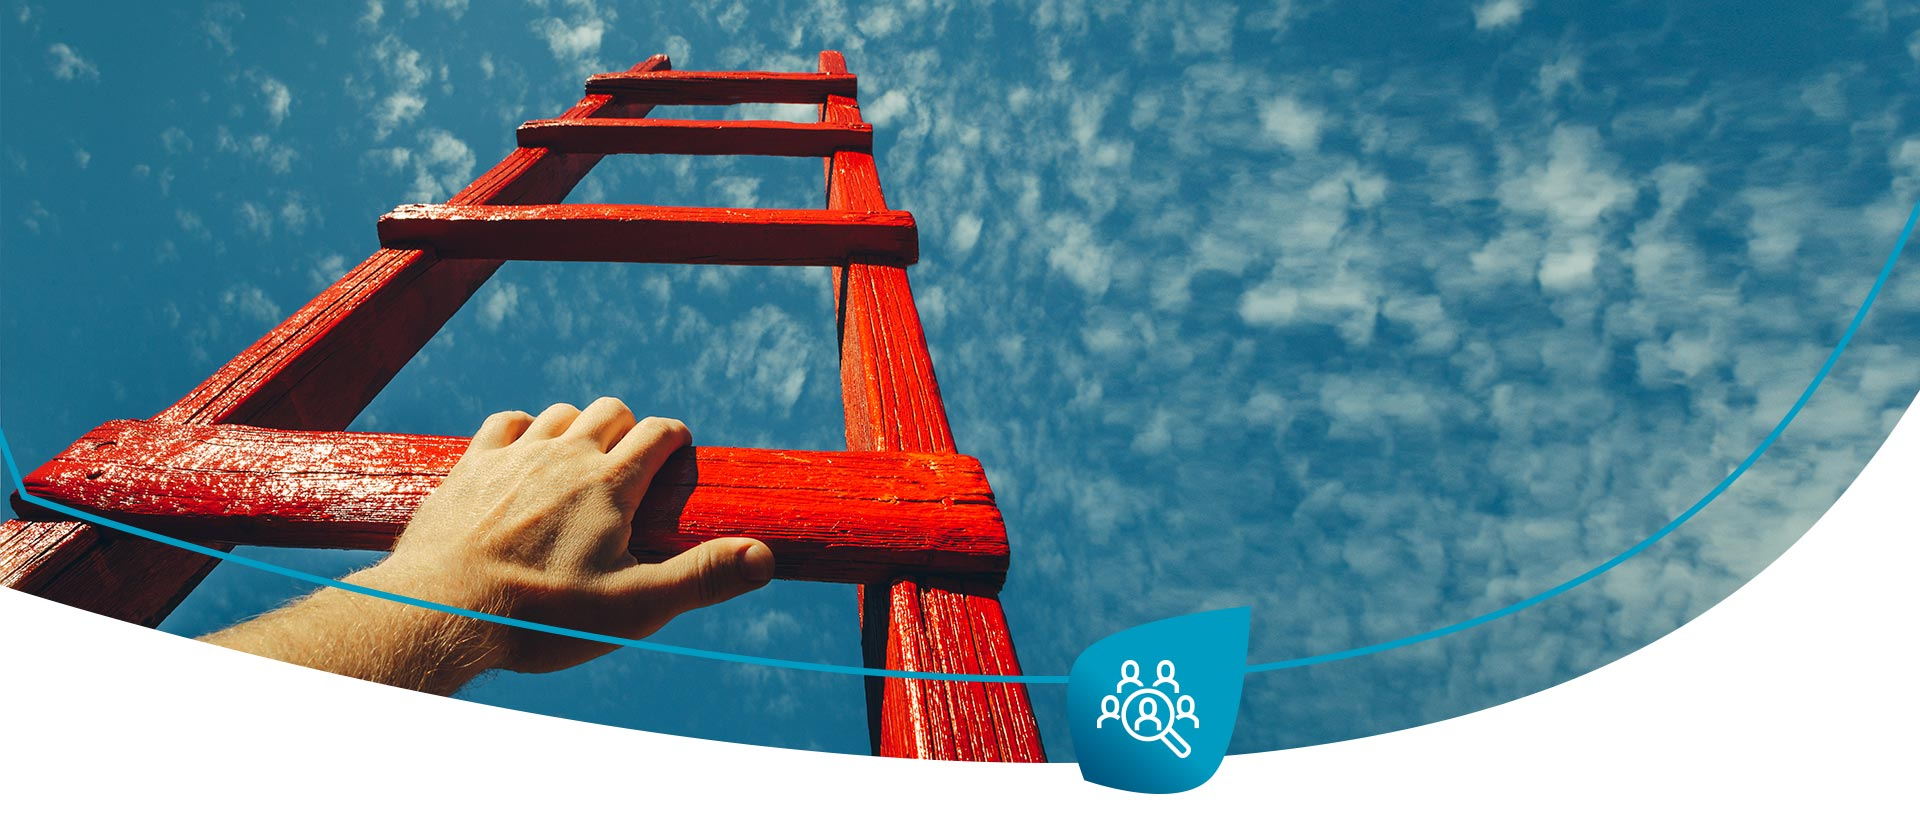 shutterstock.com - 1029299632 - Sergey Tinyakov